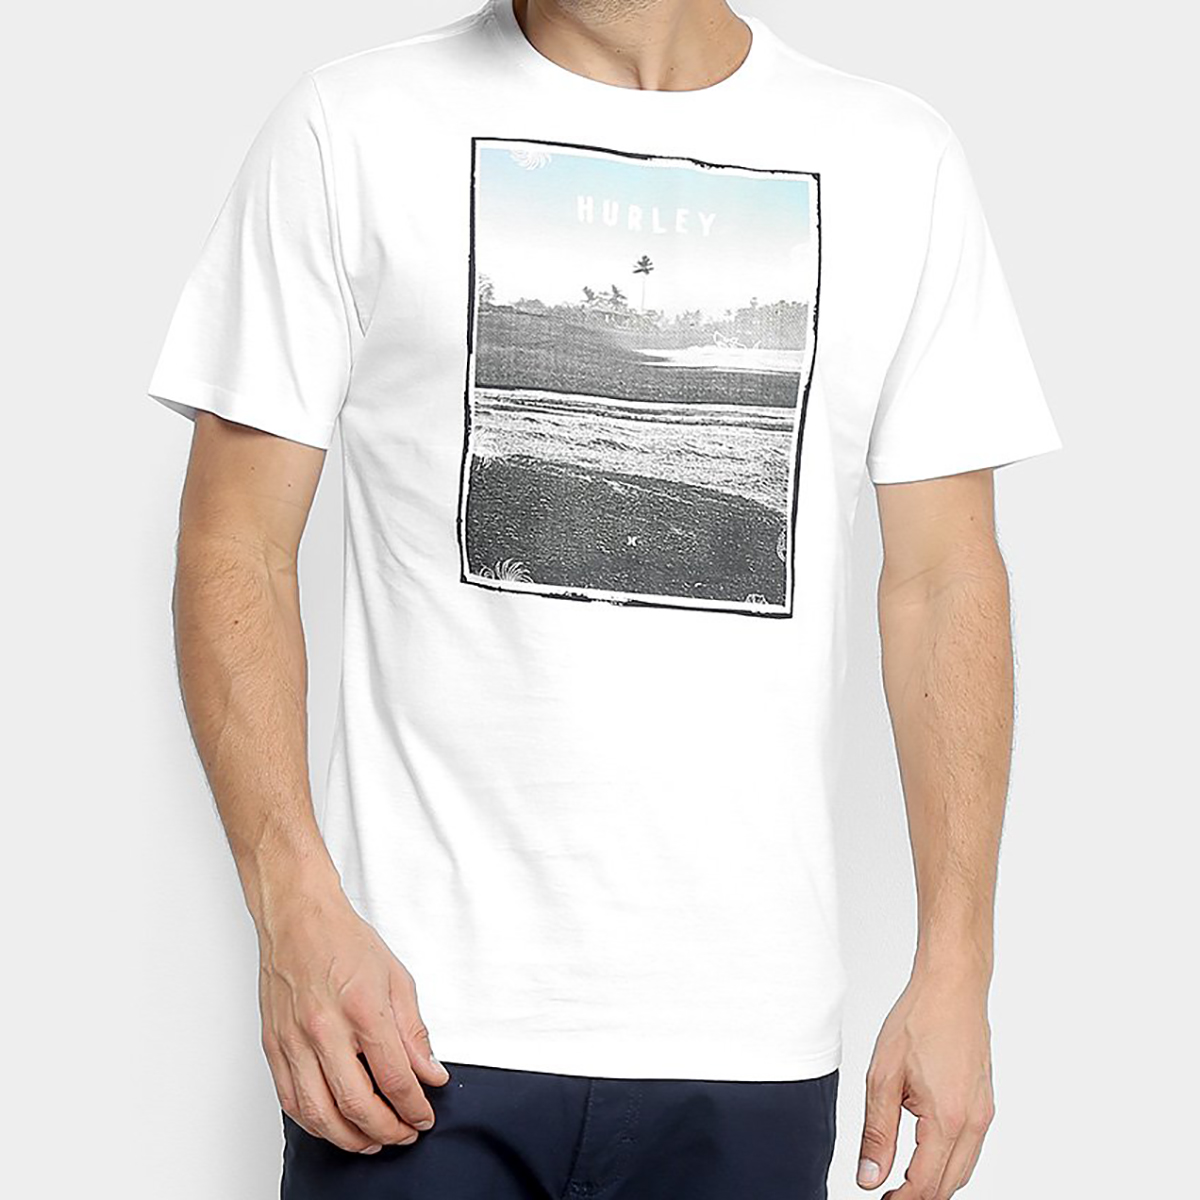 Camiseta Hurley Silk Sted Fast Masculina - Branco